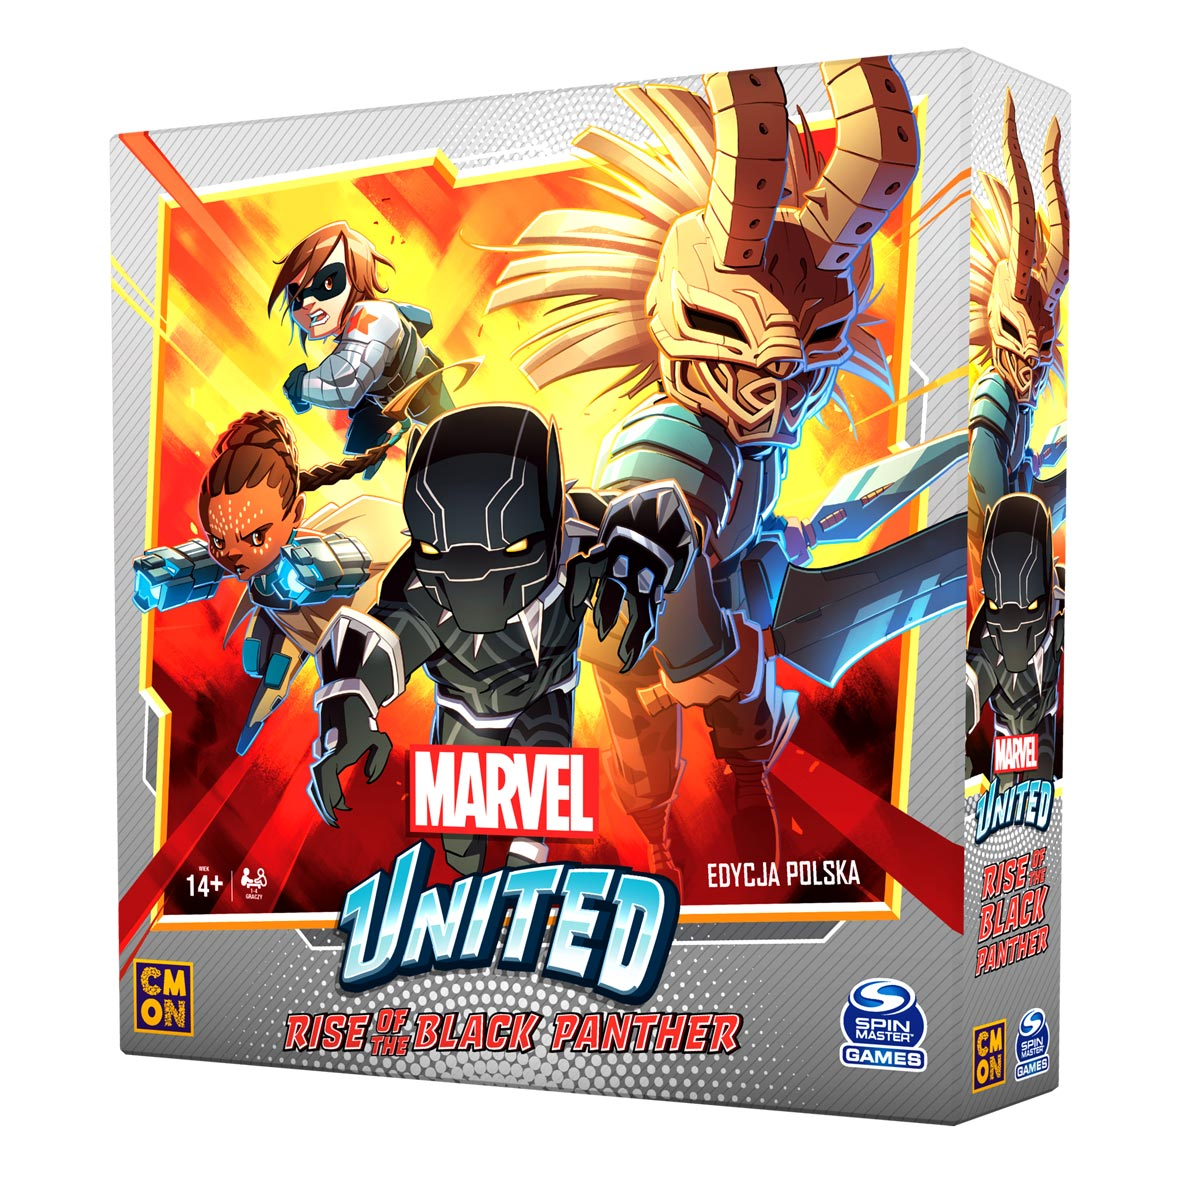 Marvel United: Rise of Black Panther (PL)